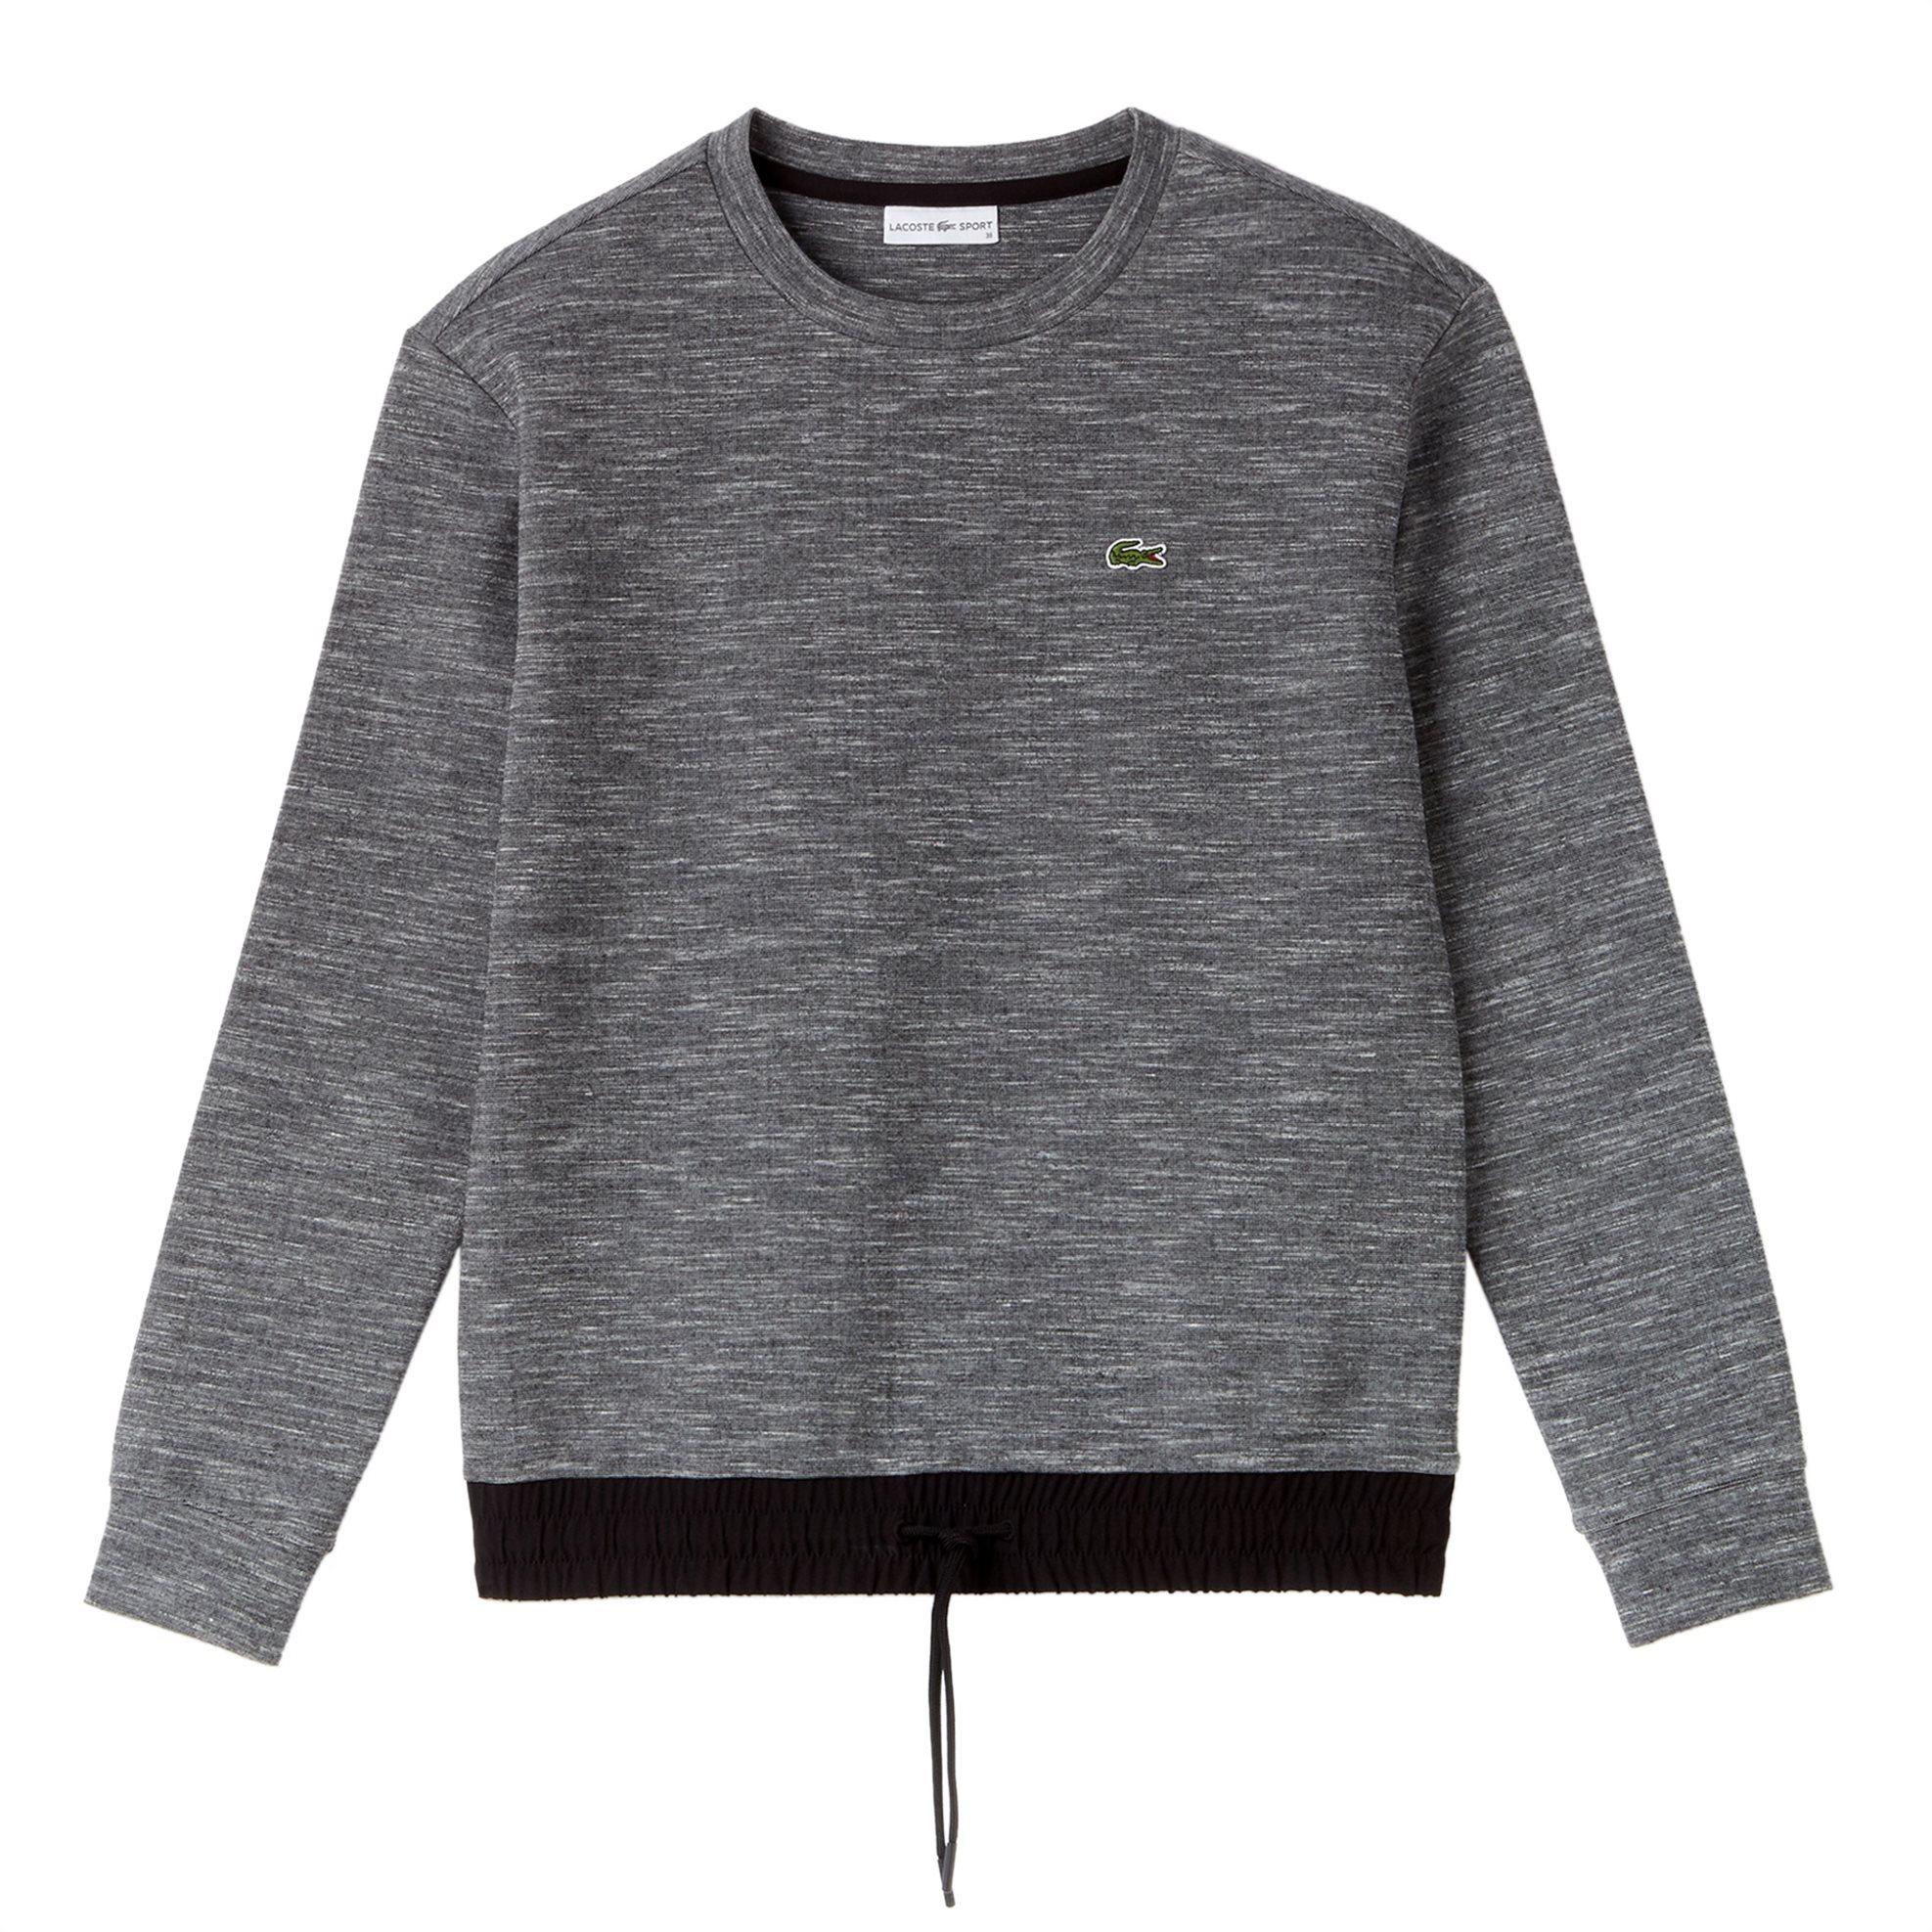 Lacoste γυναικεία μπλούζα fleece Lacoste's Tennis Collection - SF9233 - Ανθρακί γυναικα   ρουχα   tops   φούτερ μπλούζες   ζακέτες